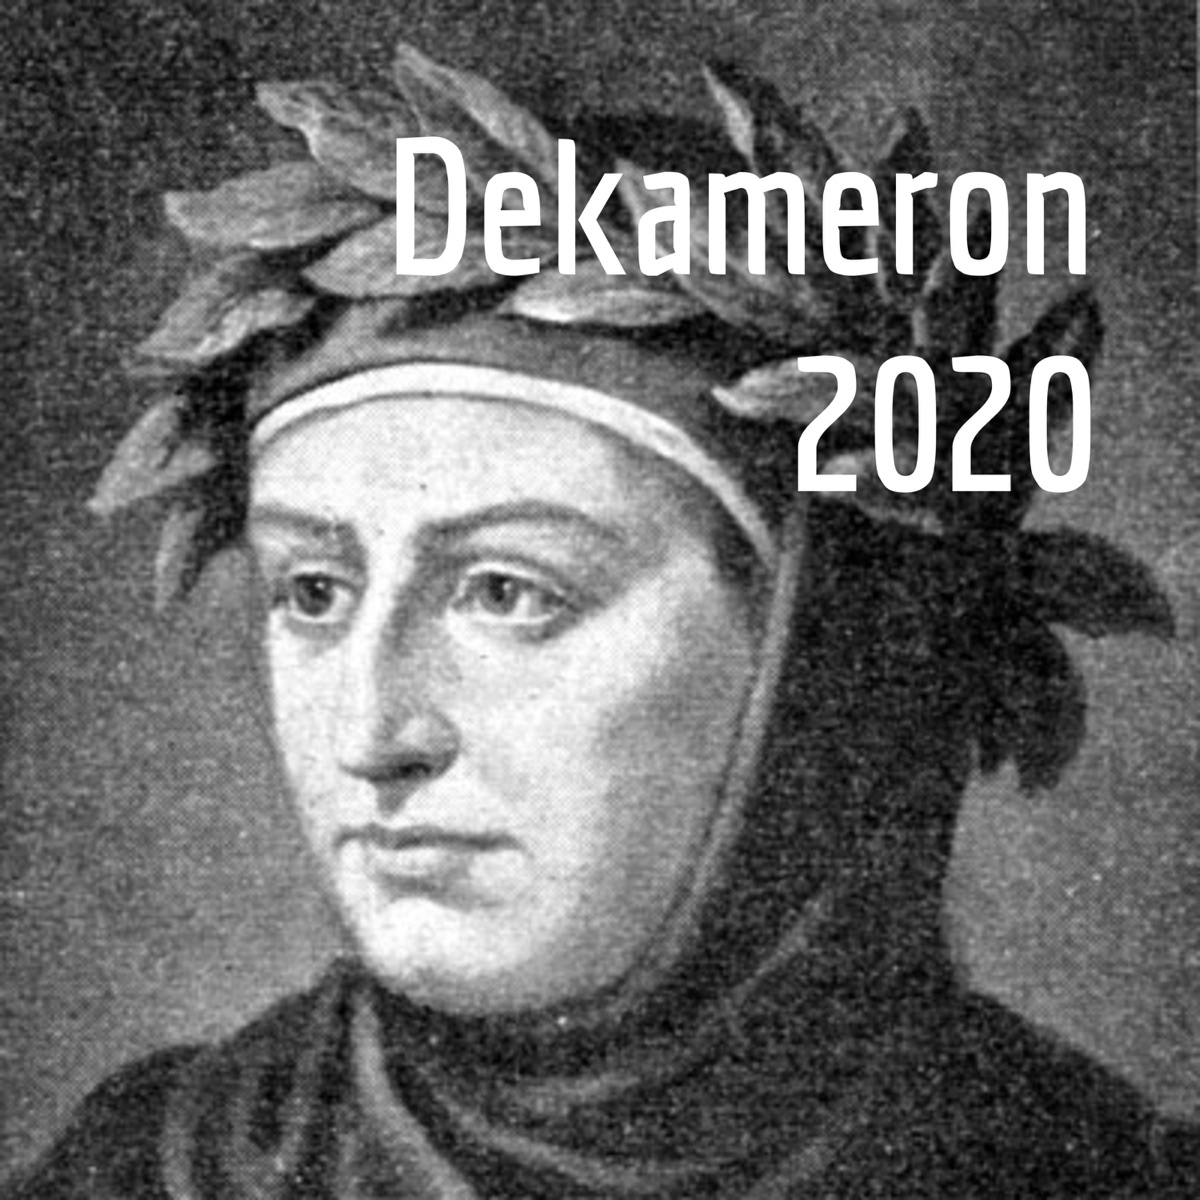 Dekameron 2020